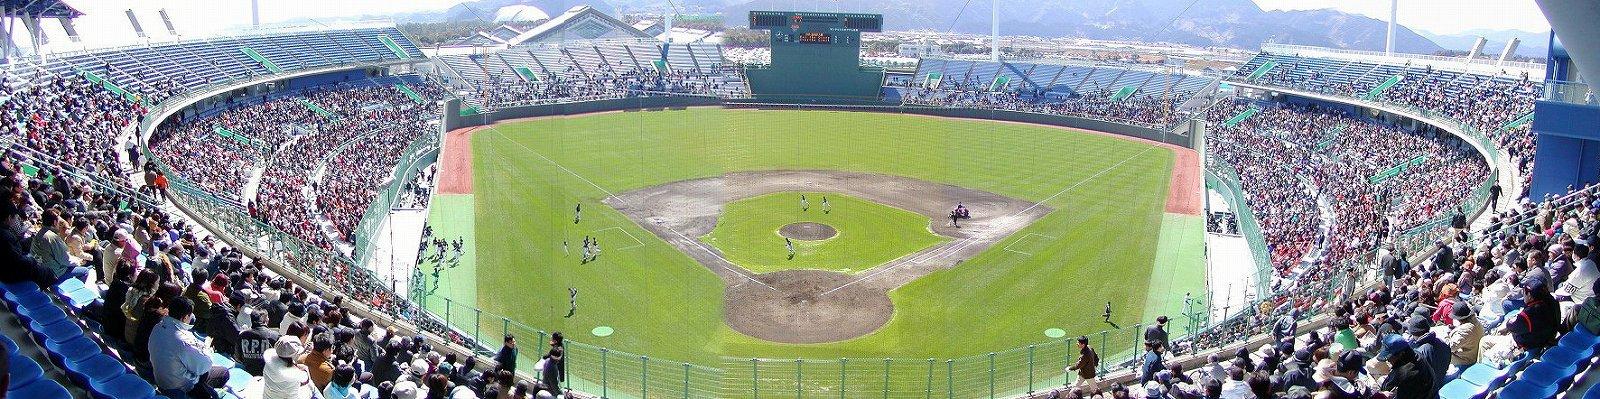 KIRISHIMA サンマリンスタジアム ホークス vs ジャイアンツ練習試合